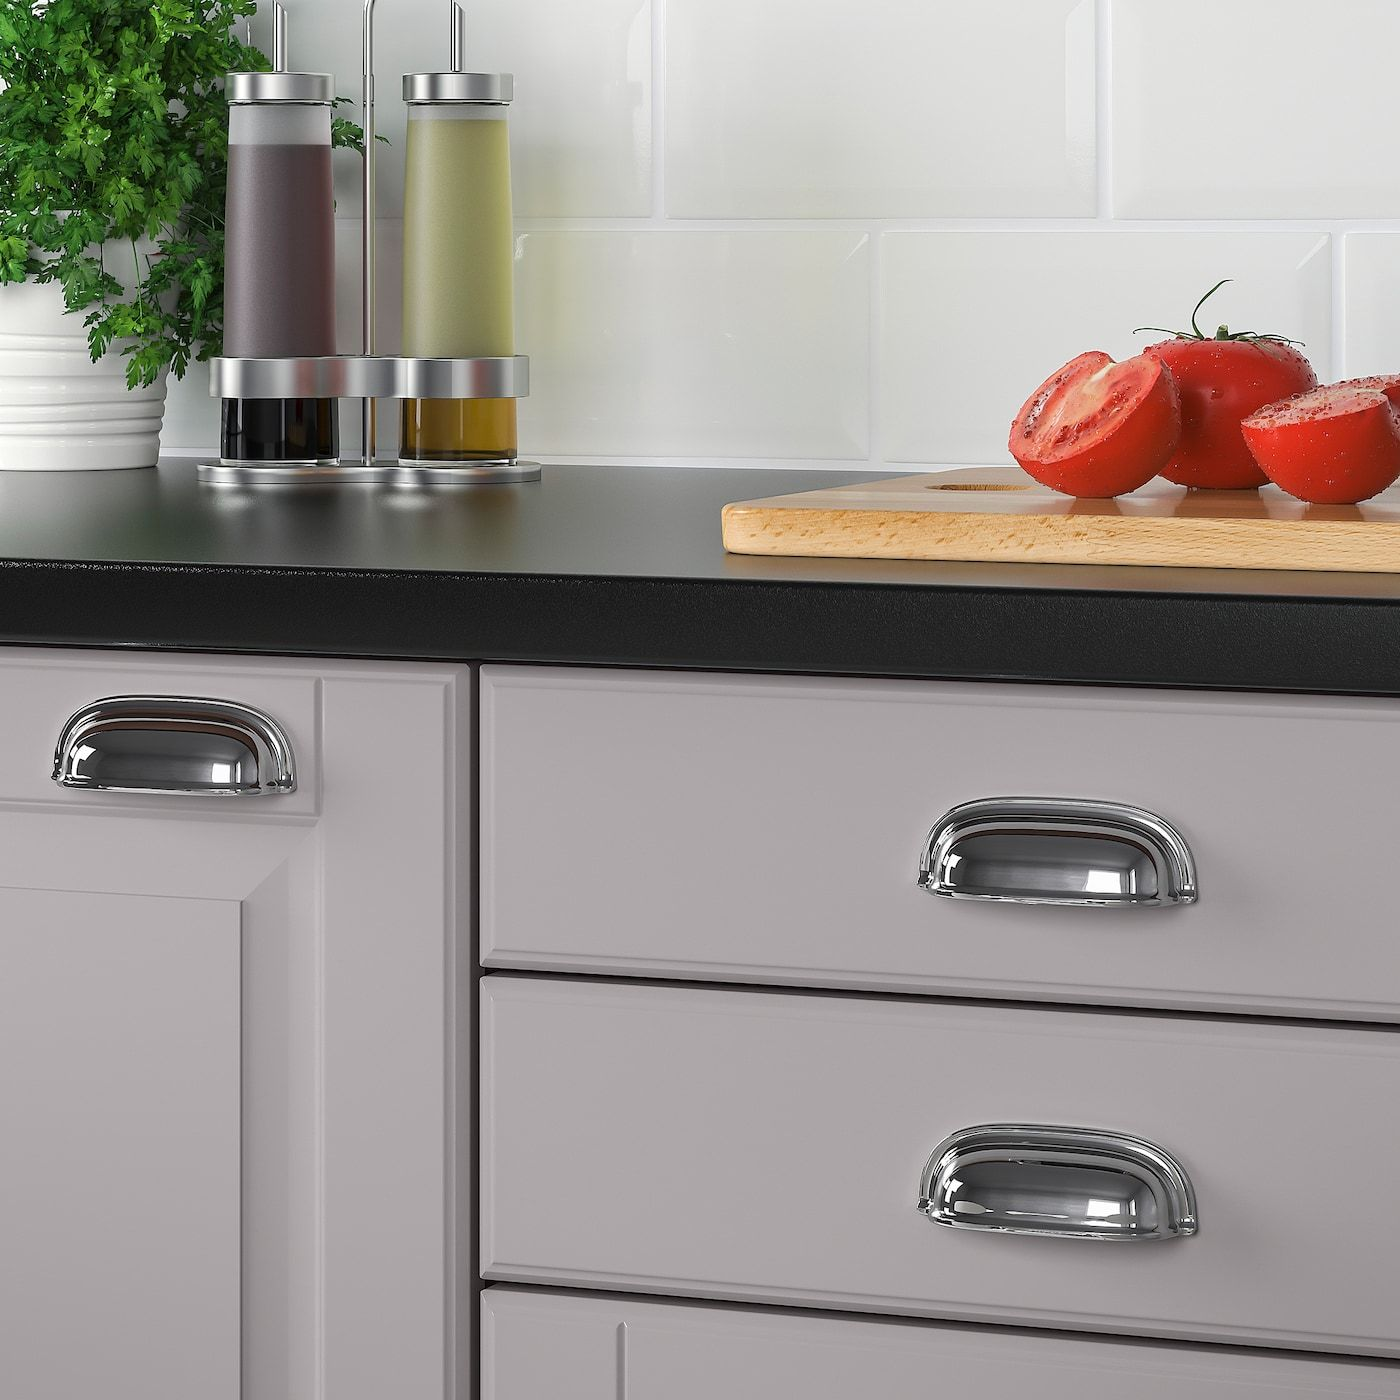 Eneryda Komgreep Verchroomd 89 Mm Ikea Cup Handles Kitchen Kitchen Door Handles Cup Handles